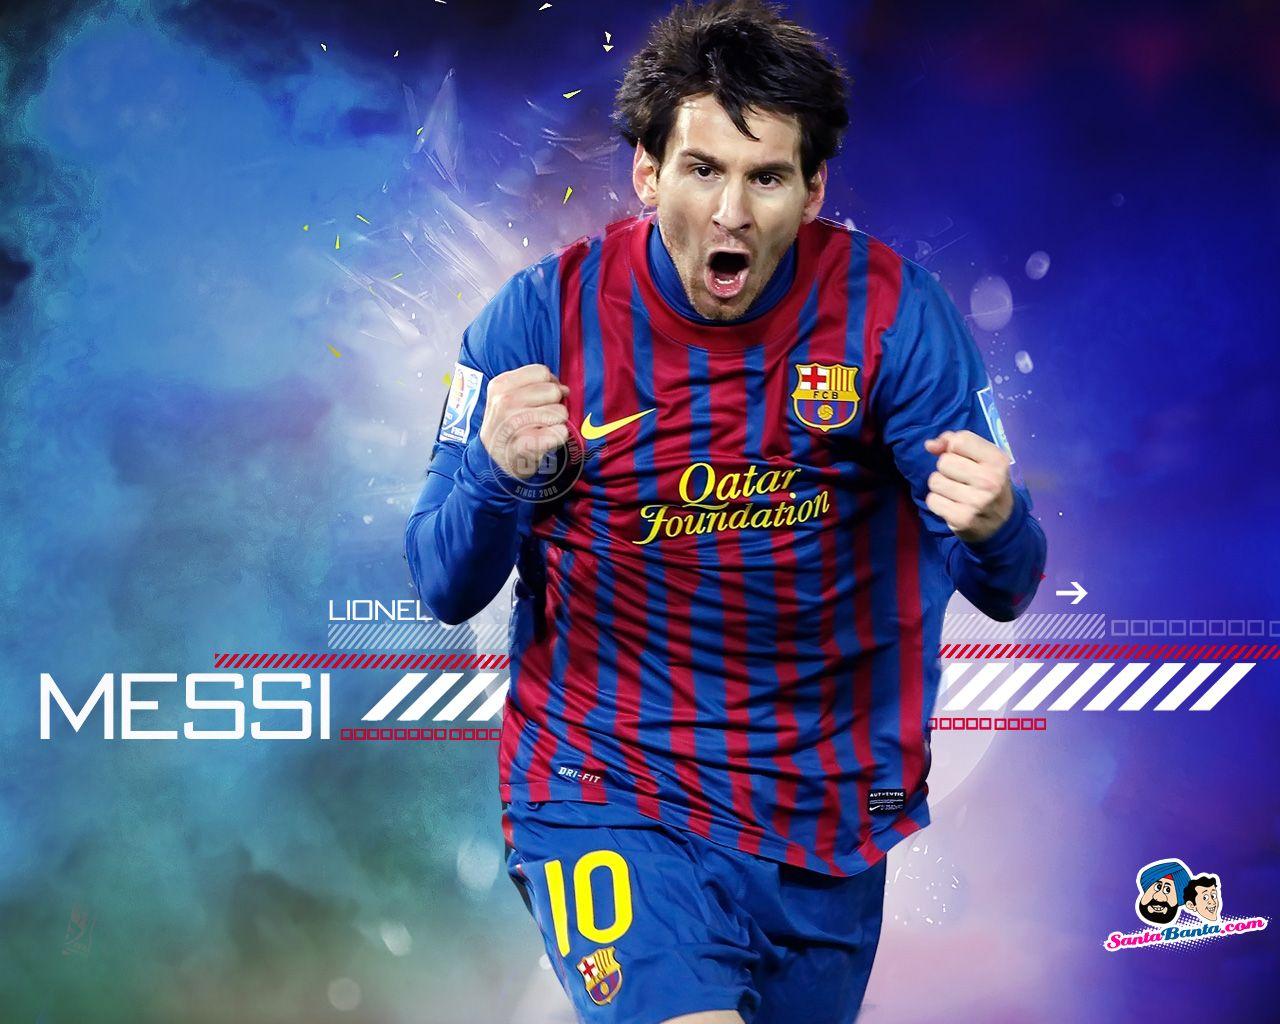 Lionel Messi HD Wallpapers   HD Wallpapers Hi5 1280x1024